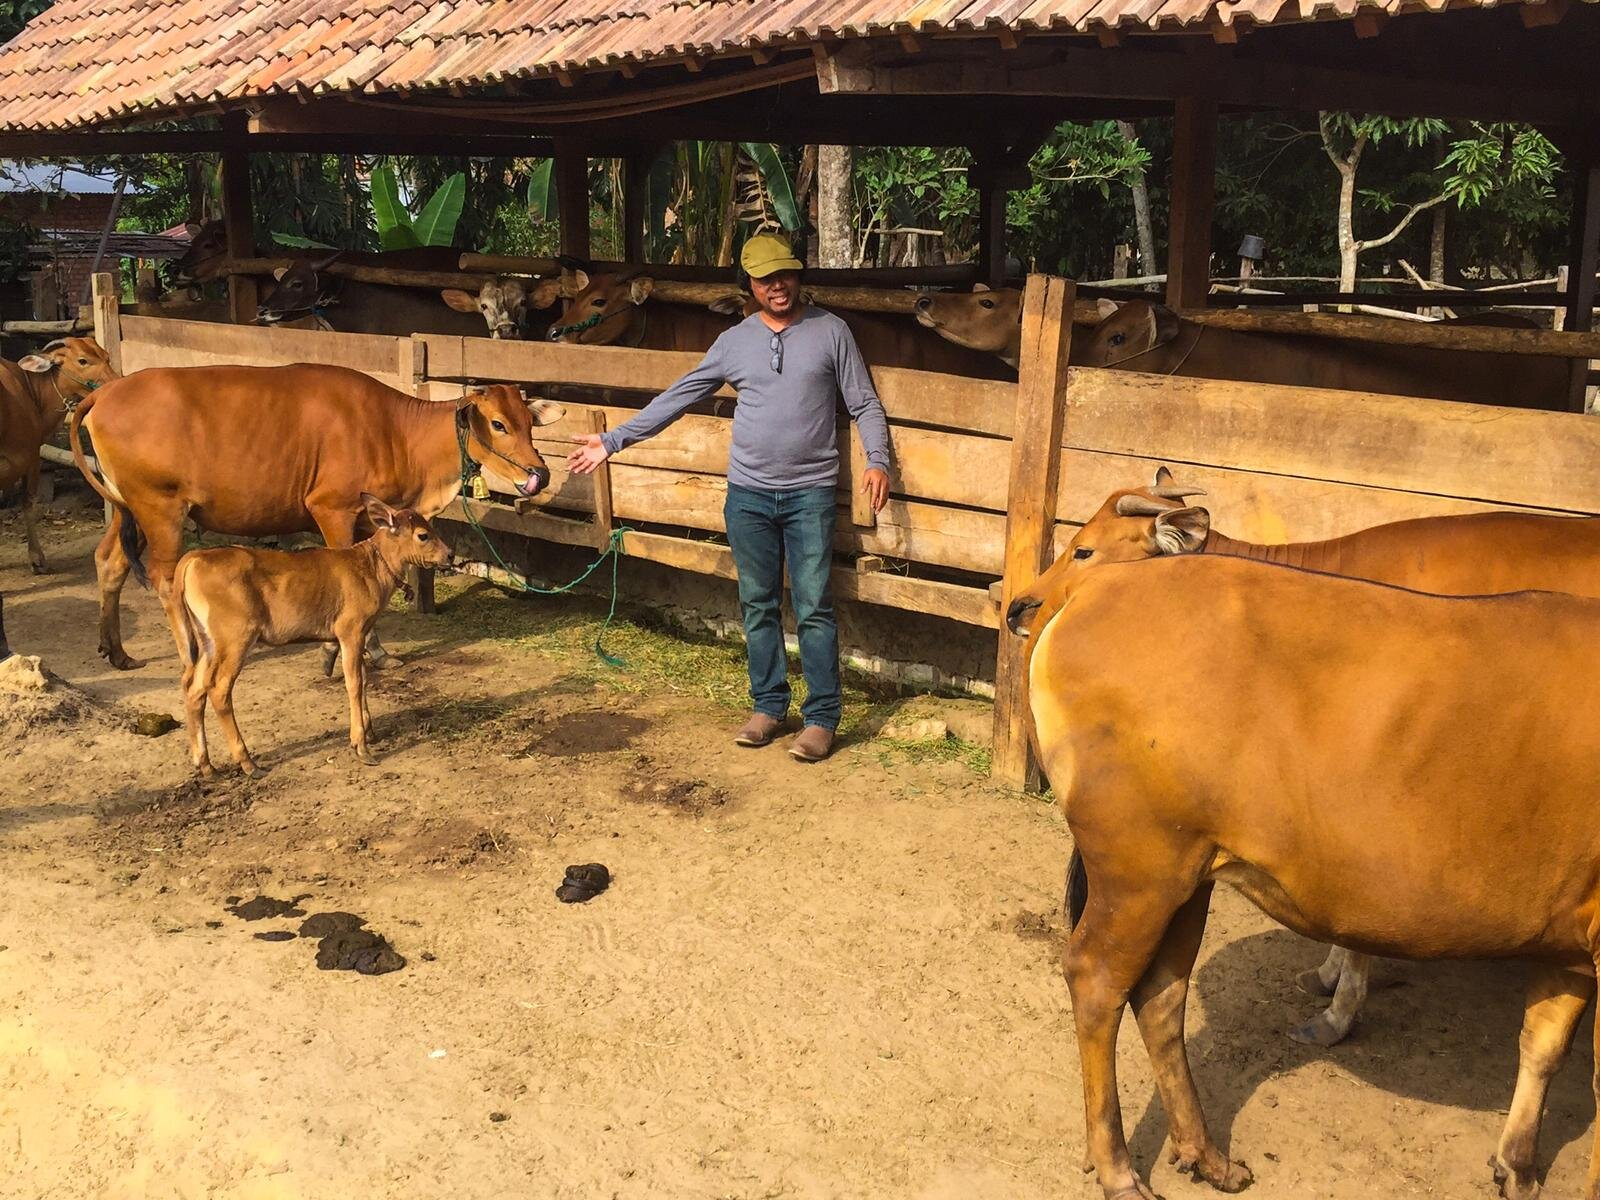 Mr Alipio de Almeida pictured during animal enrolment activity in South Sumatra, August 2019.  Photo: Kieren McCosker